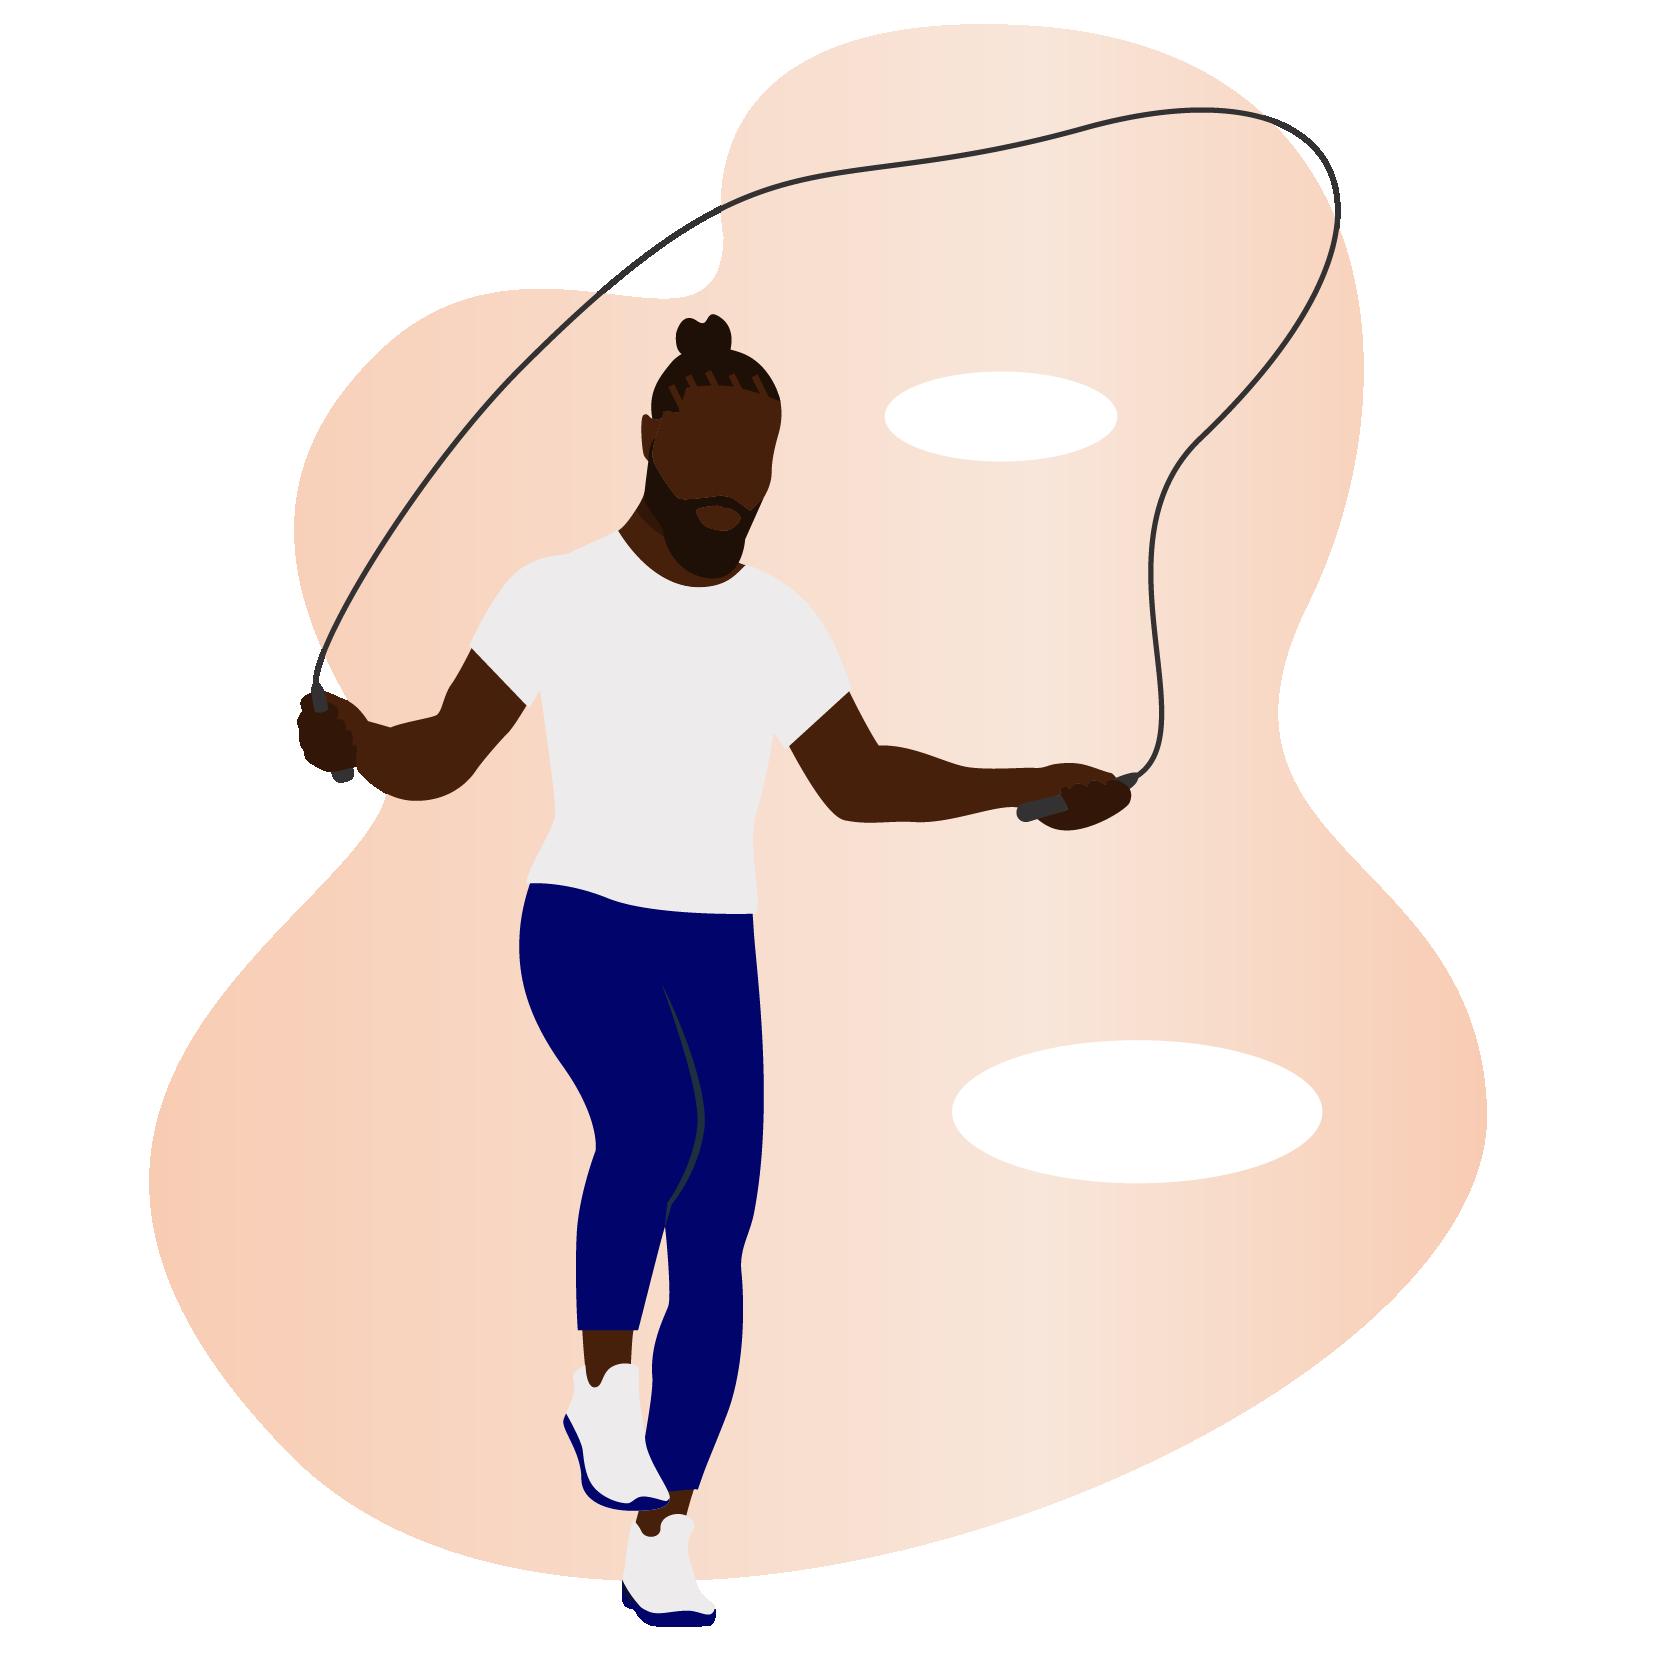 A black man jumping rope